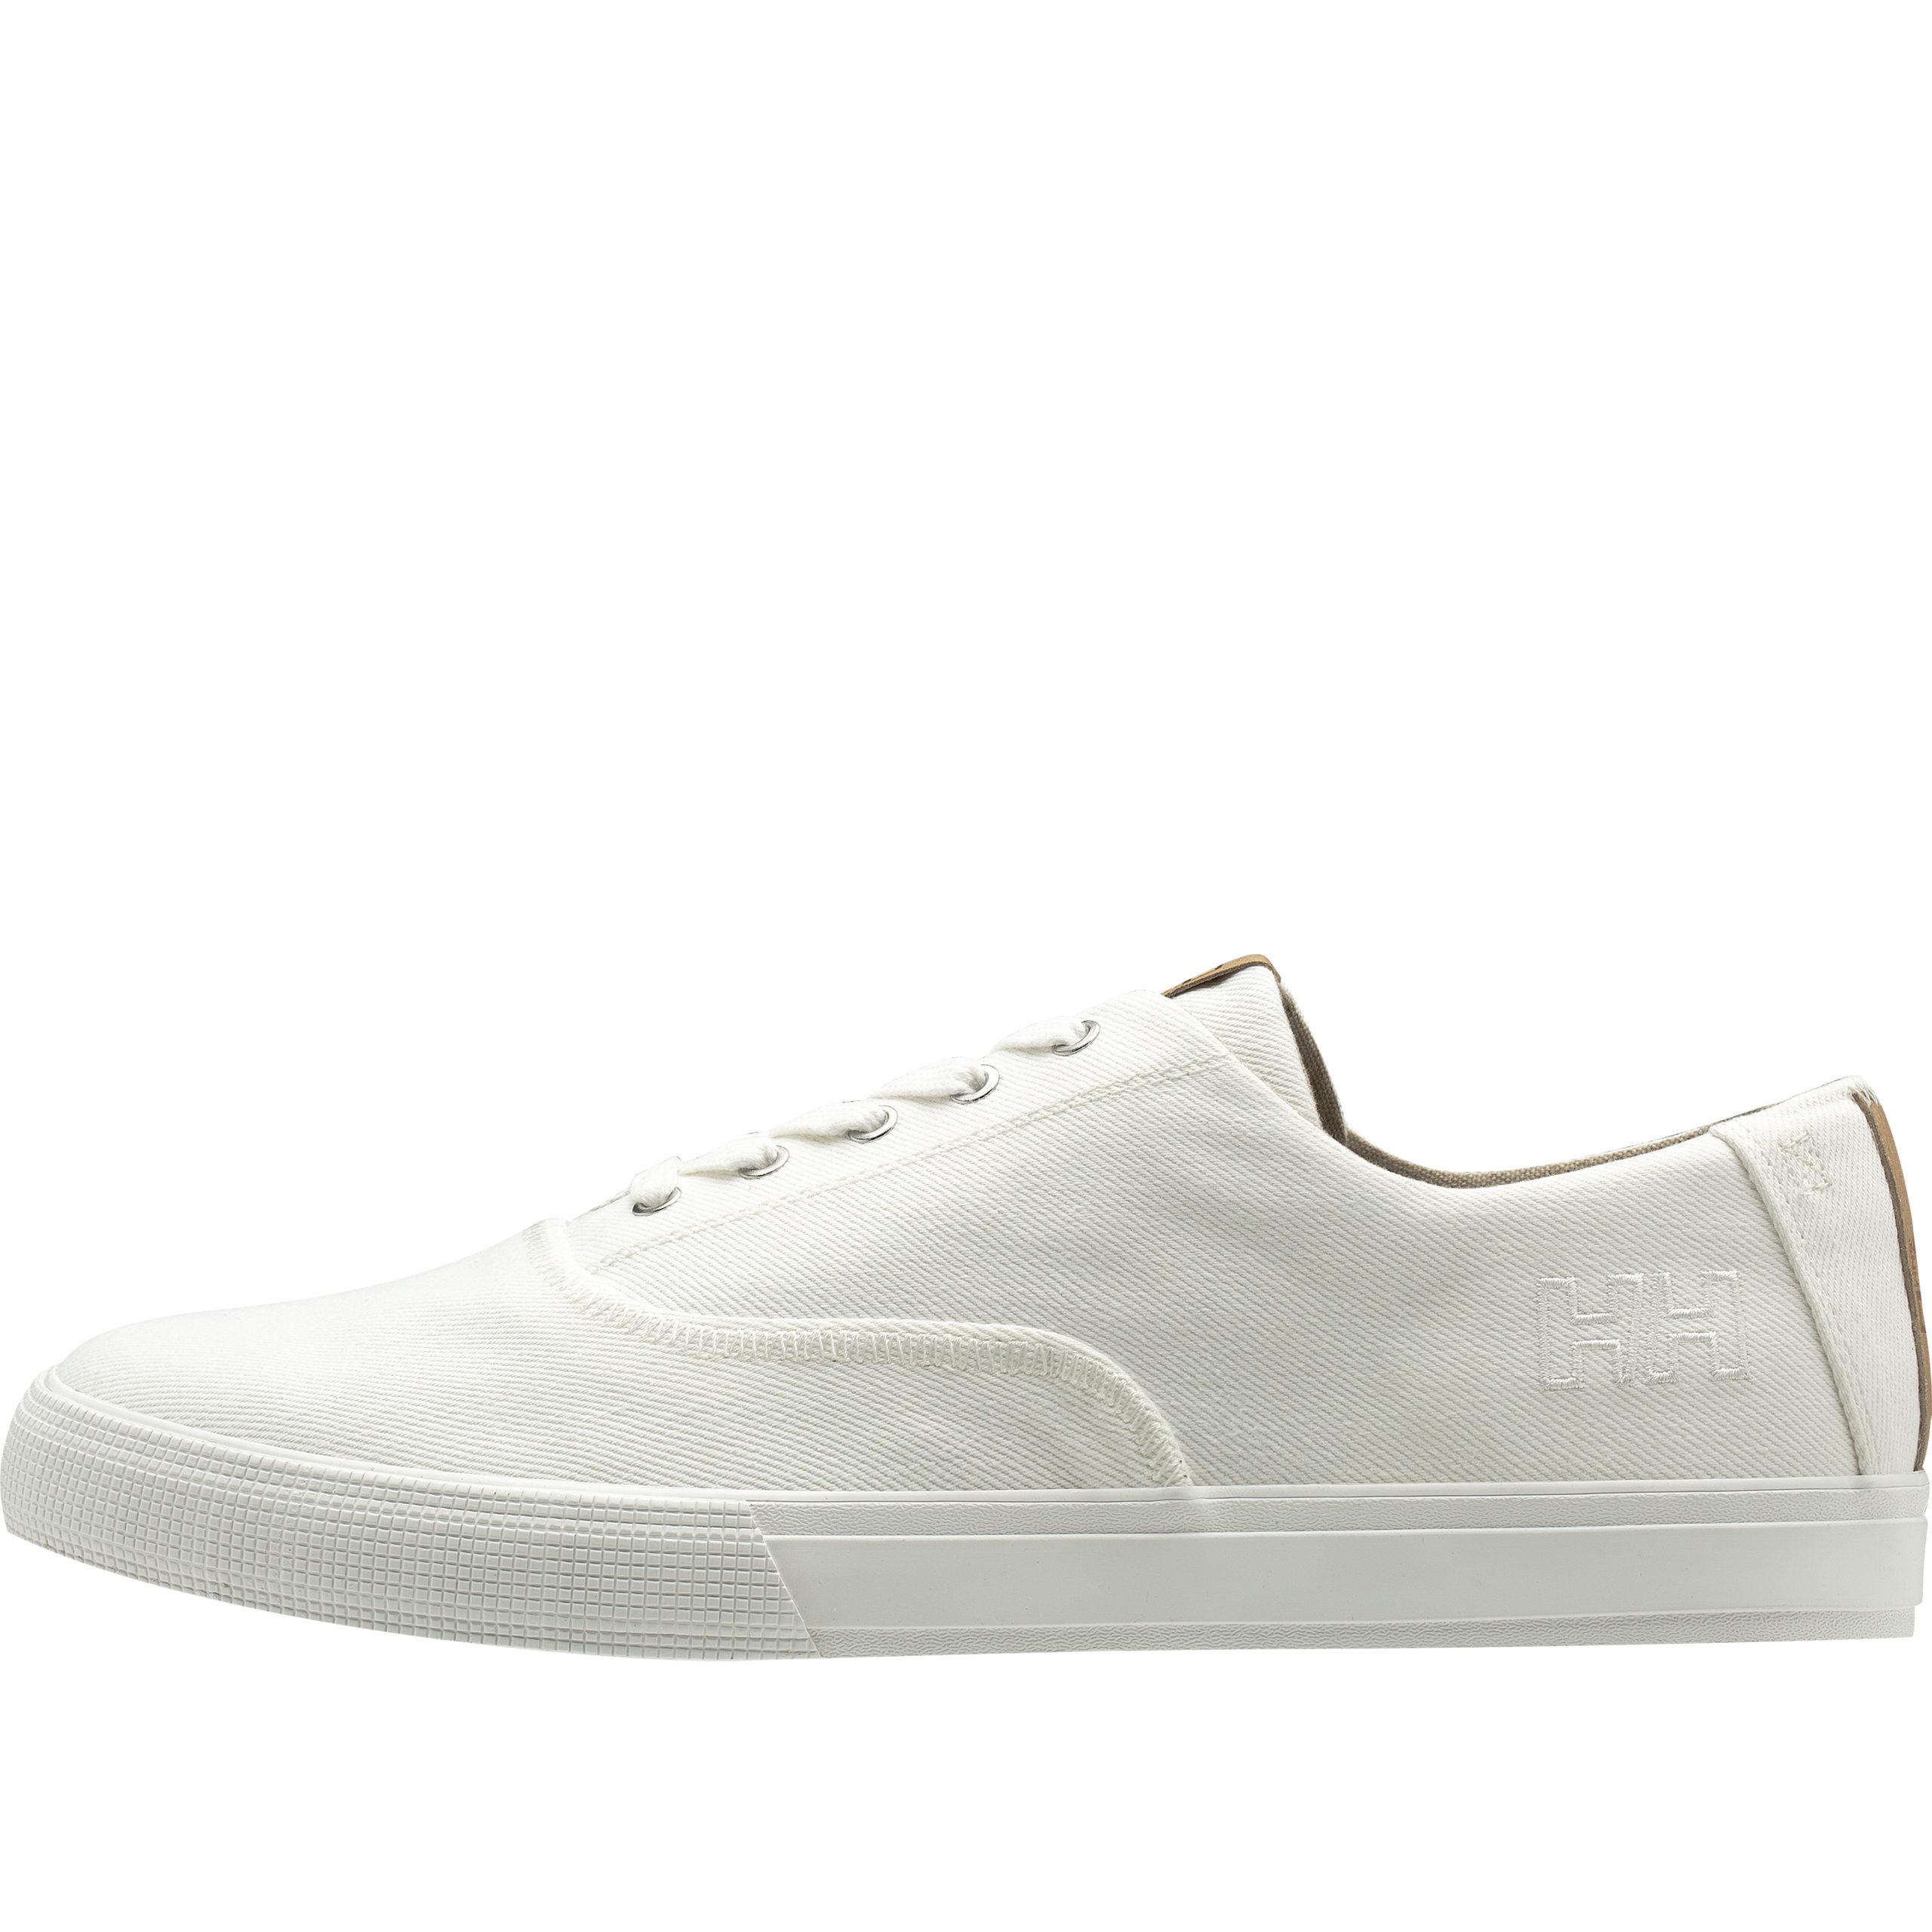 Helly Hansen Mens Azure Casual Shoe